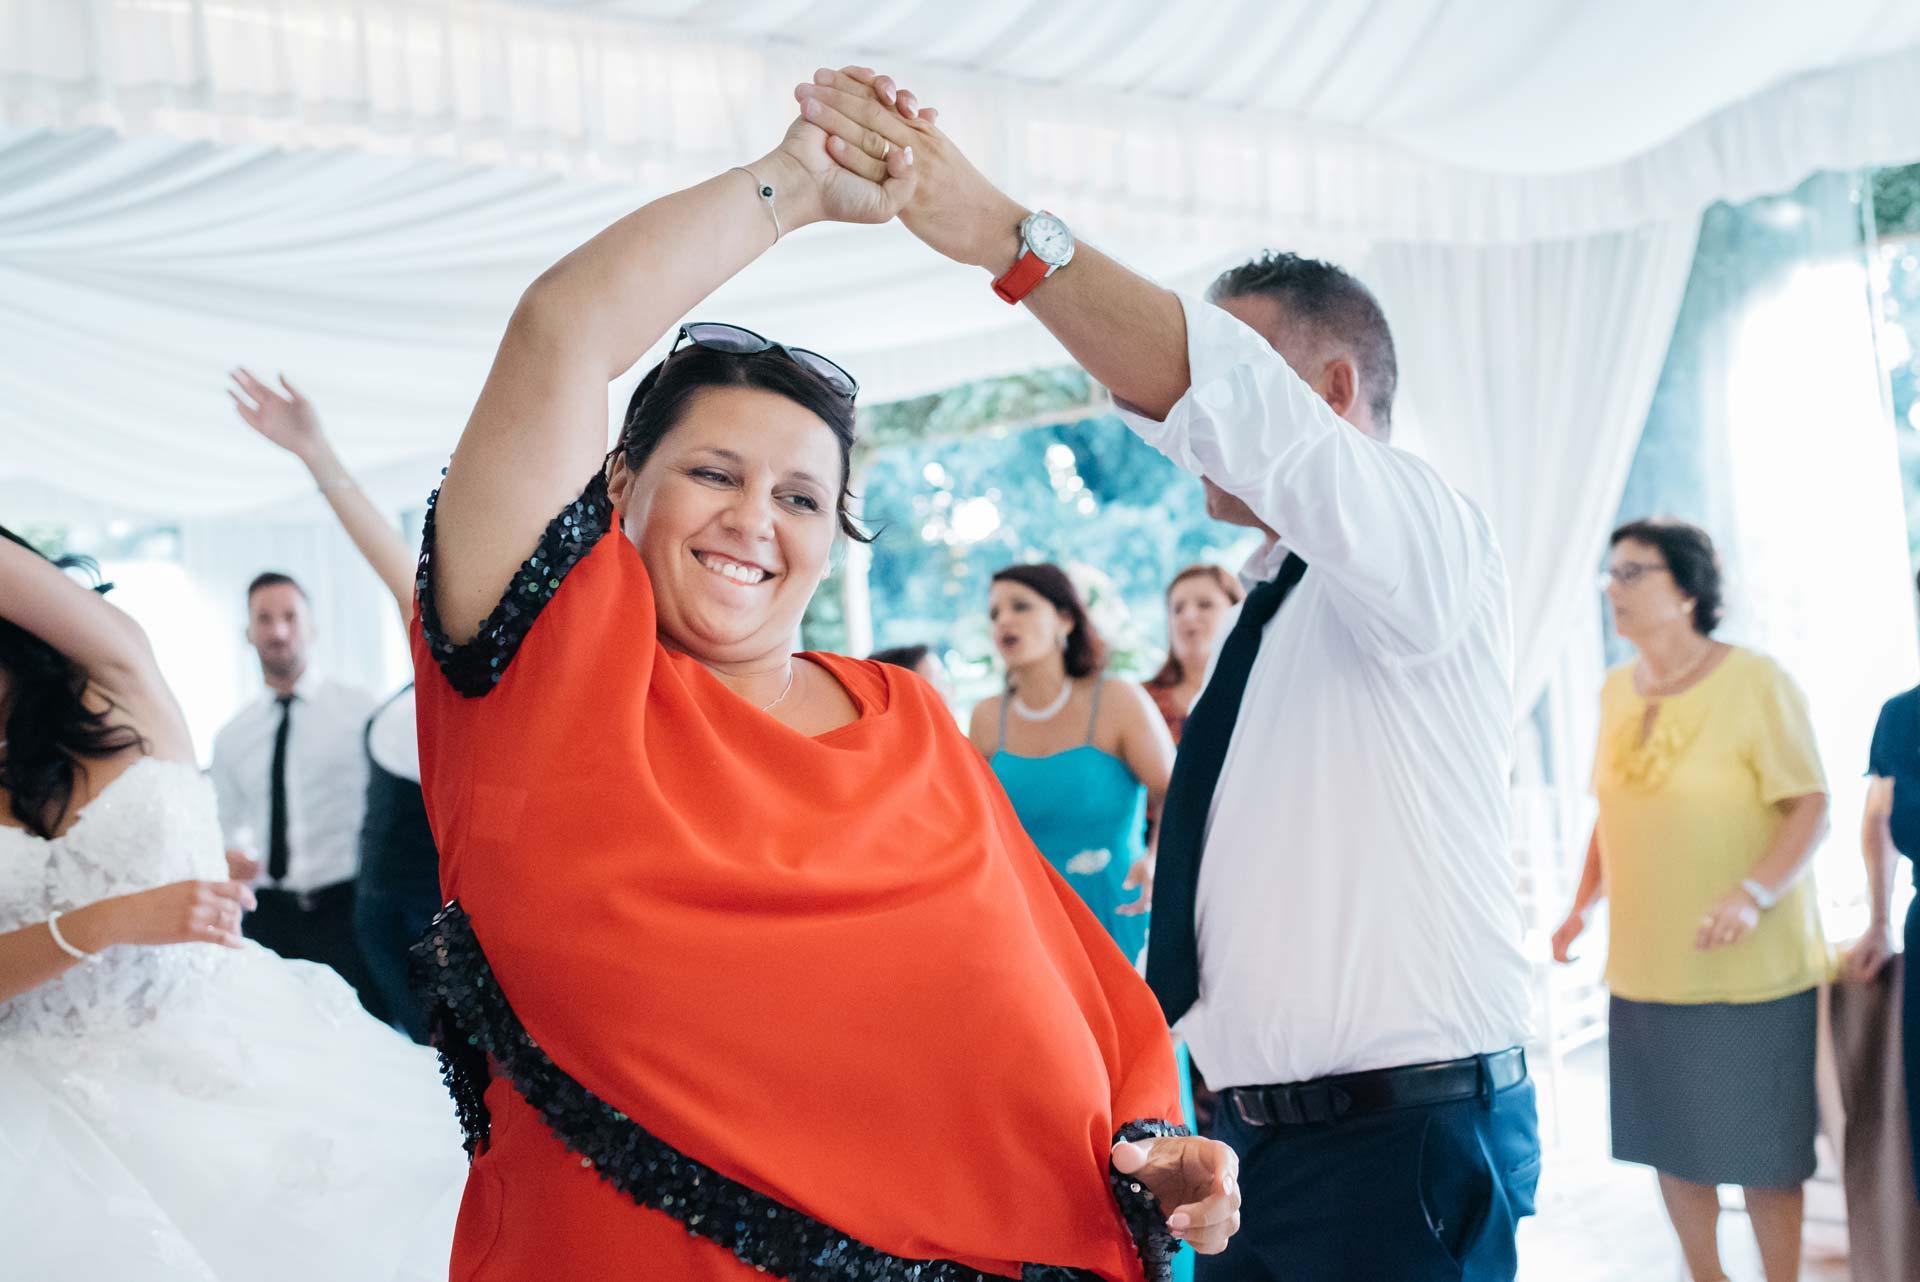 foto-matrimonio-reportage-f&a-8-simone-nunzi